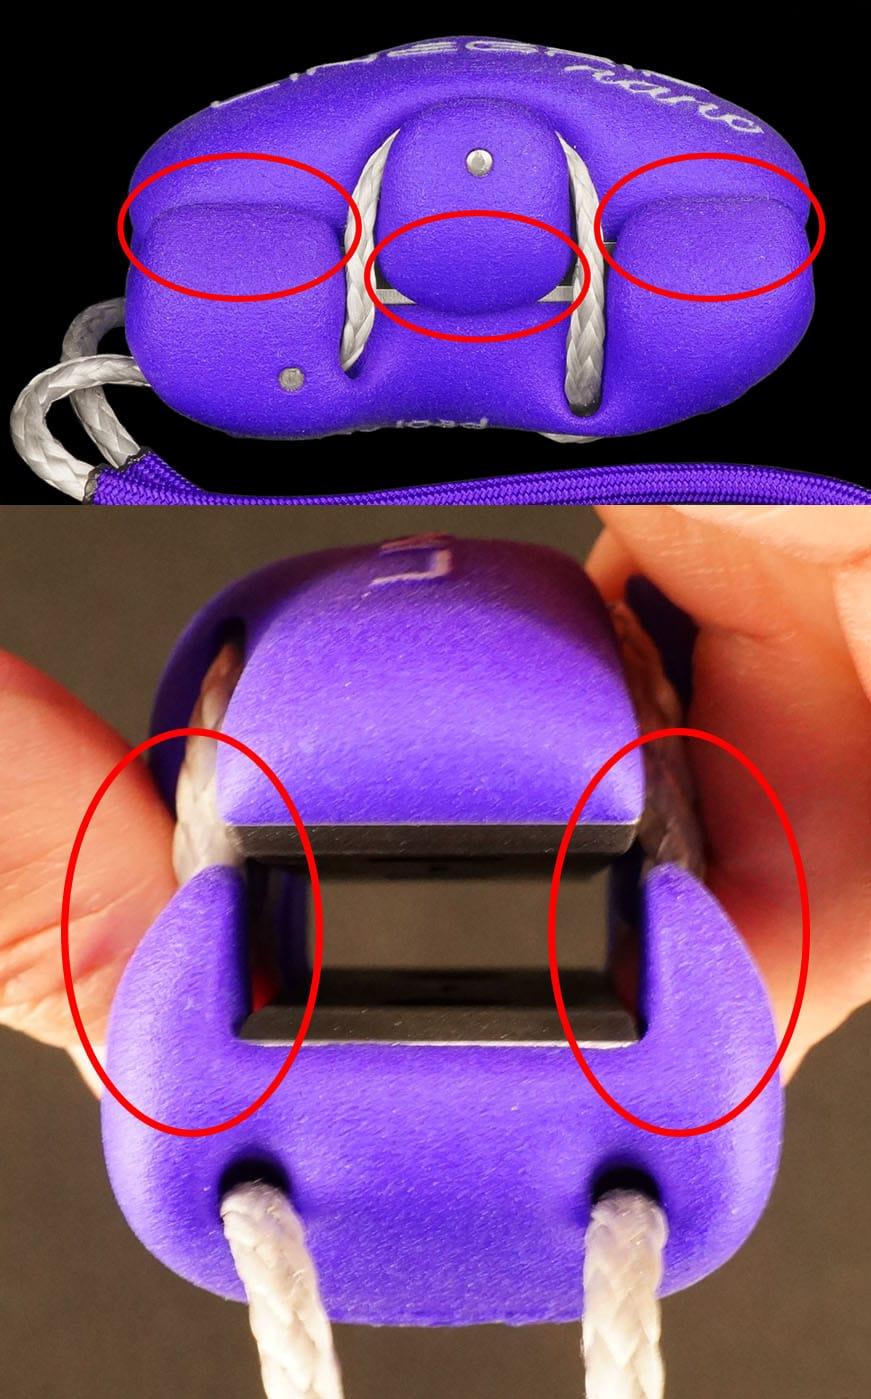 linegrip nano dyneema protective sheath